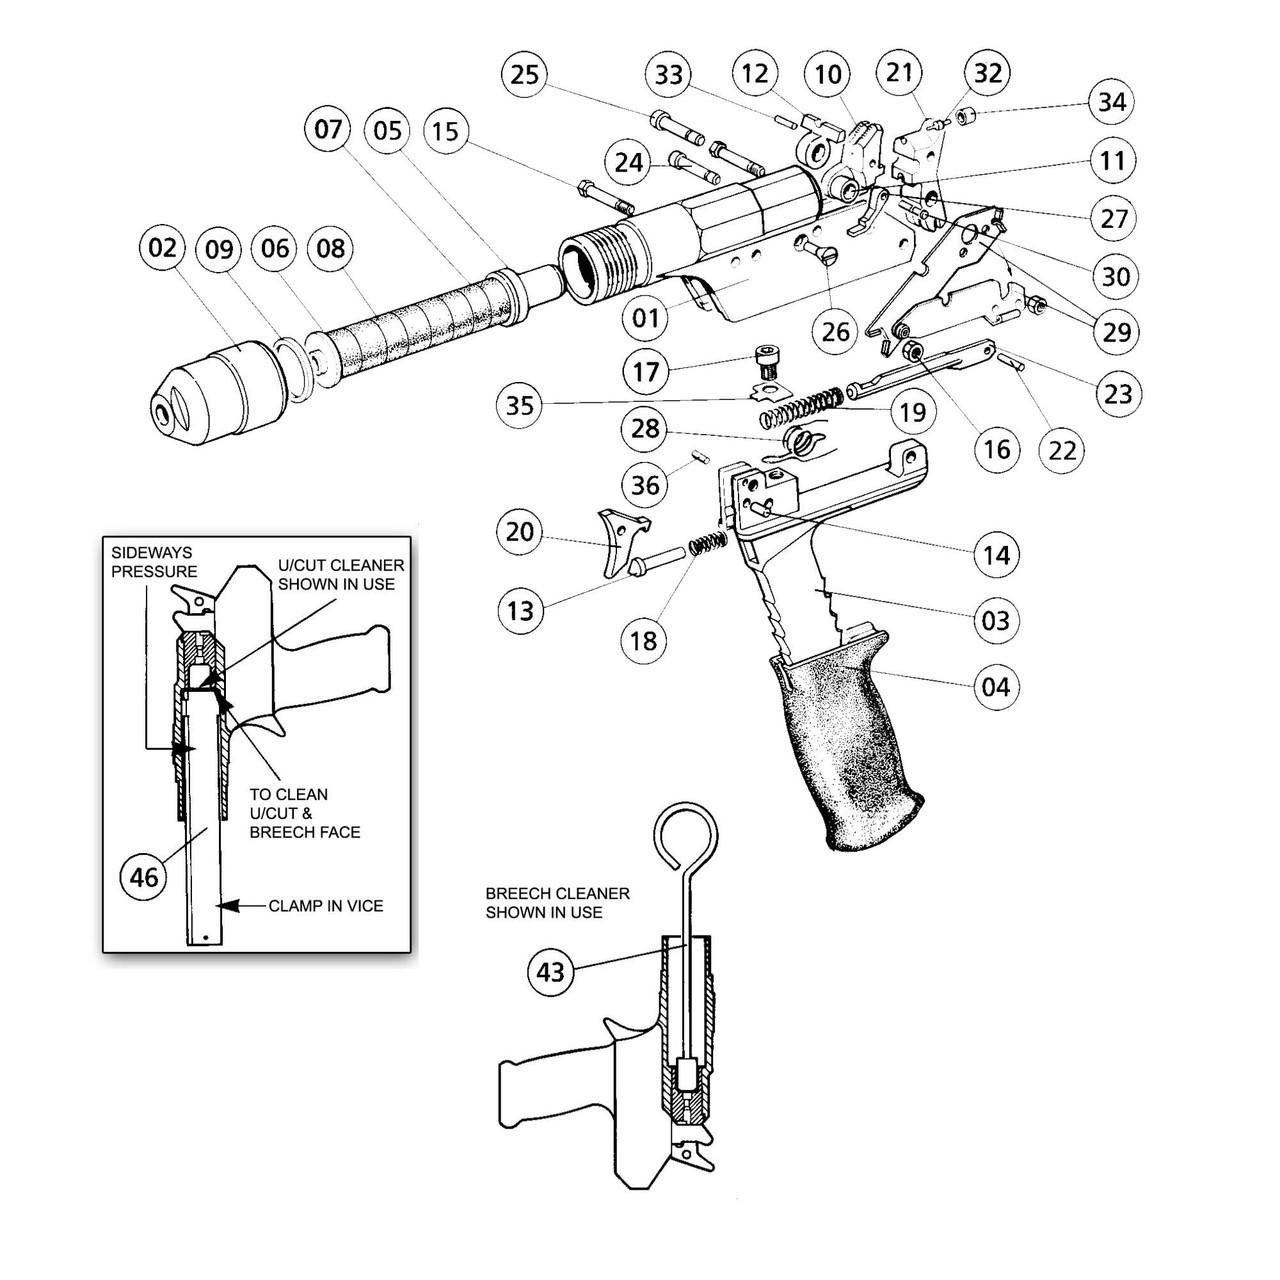 Accles & Shelvoke - CASH® Special .25 Caliber Heavy-Duty Stunner - Regular Bolt